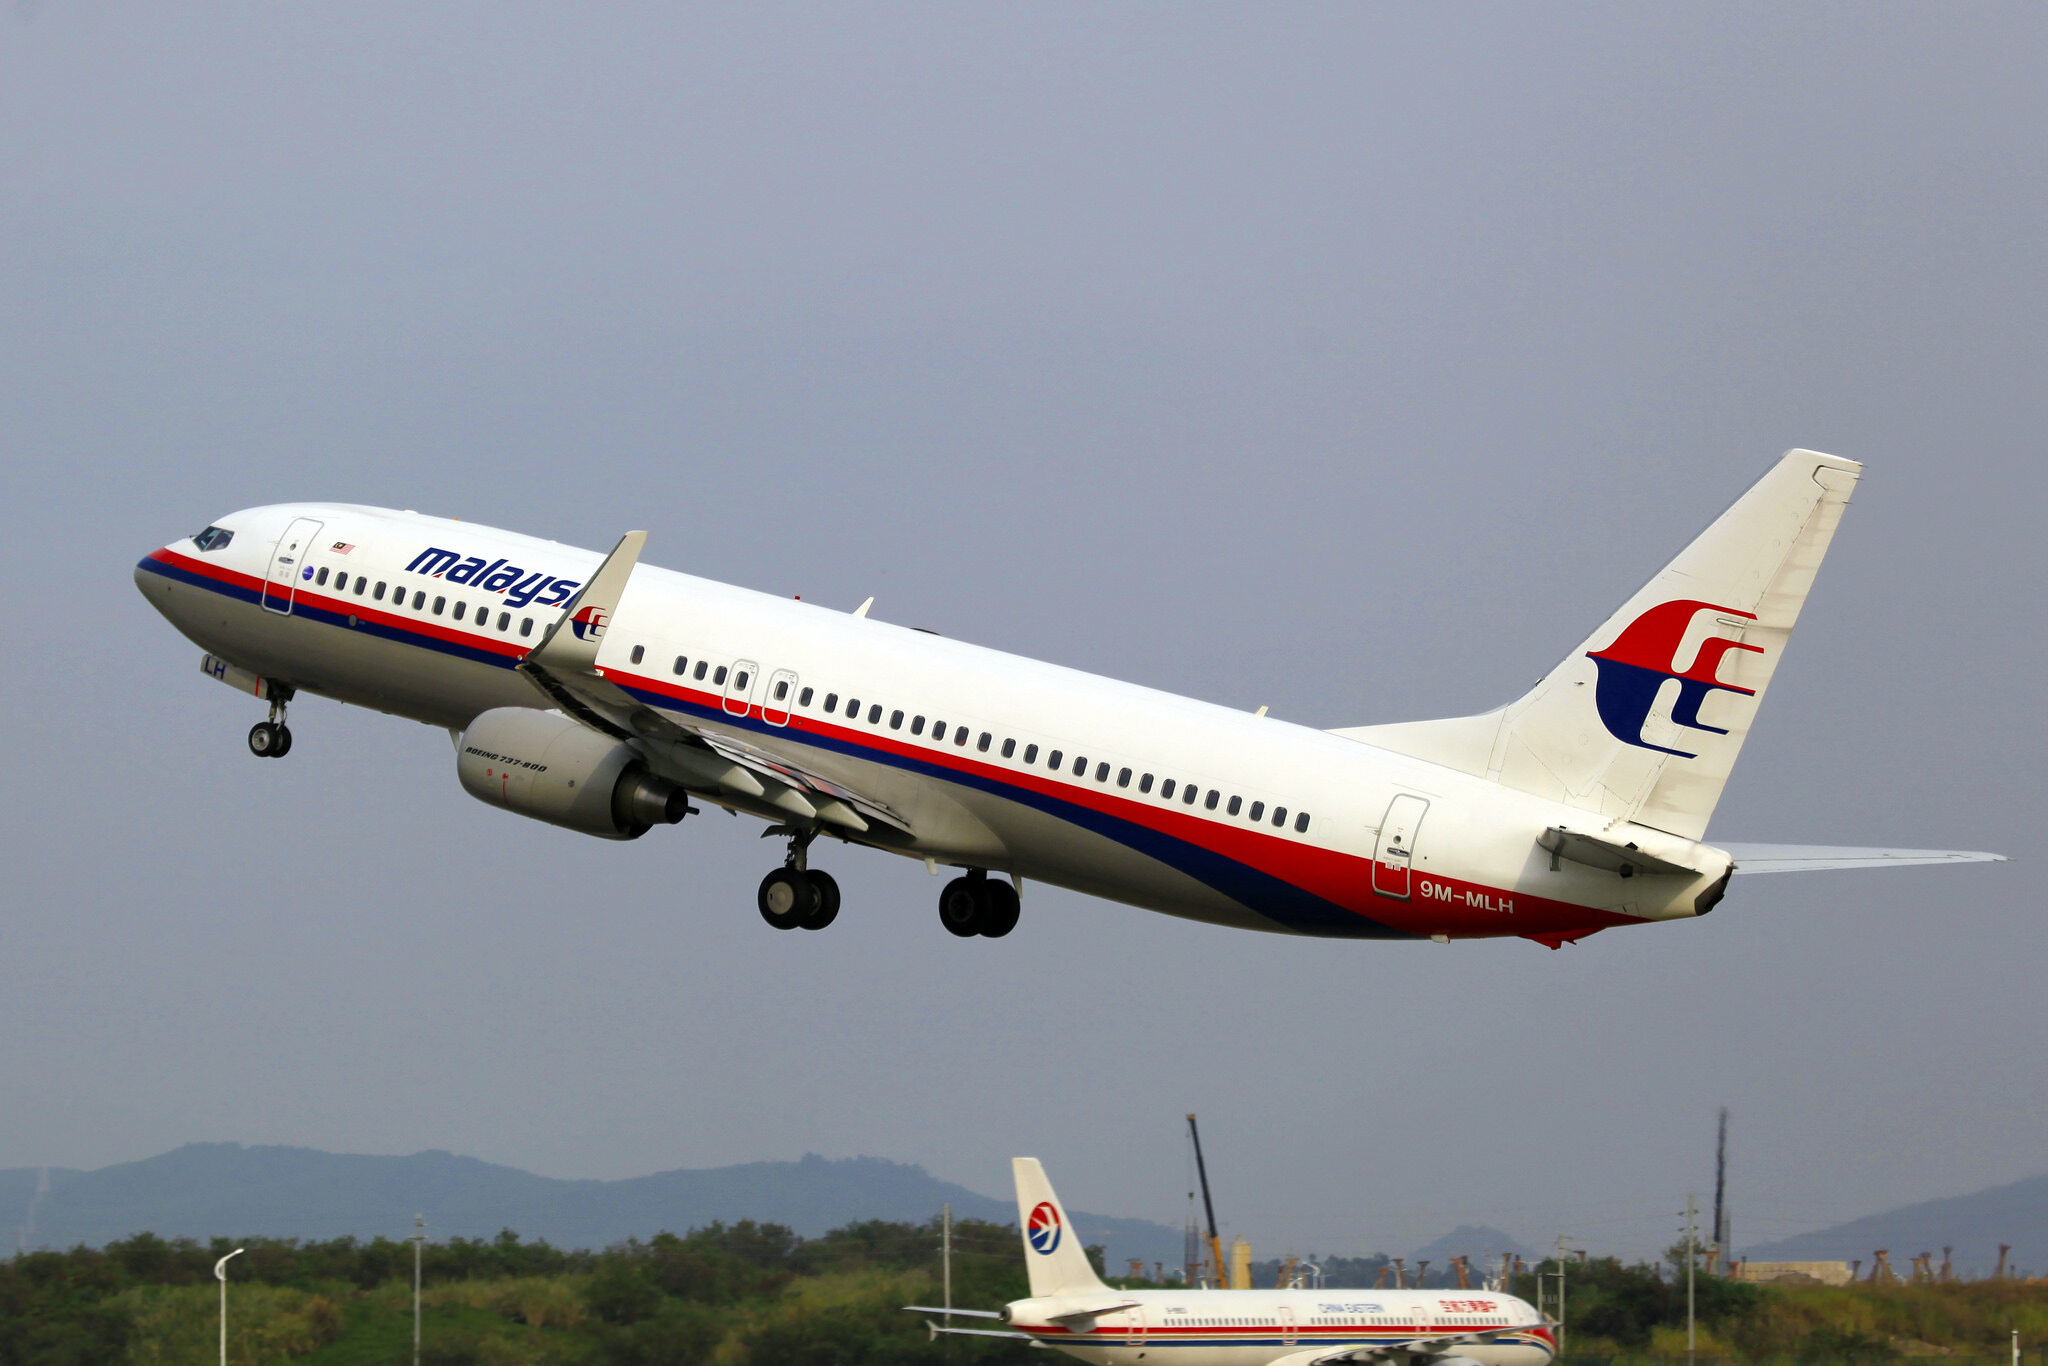 Samolot MH370